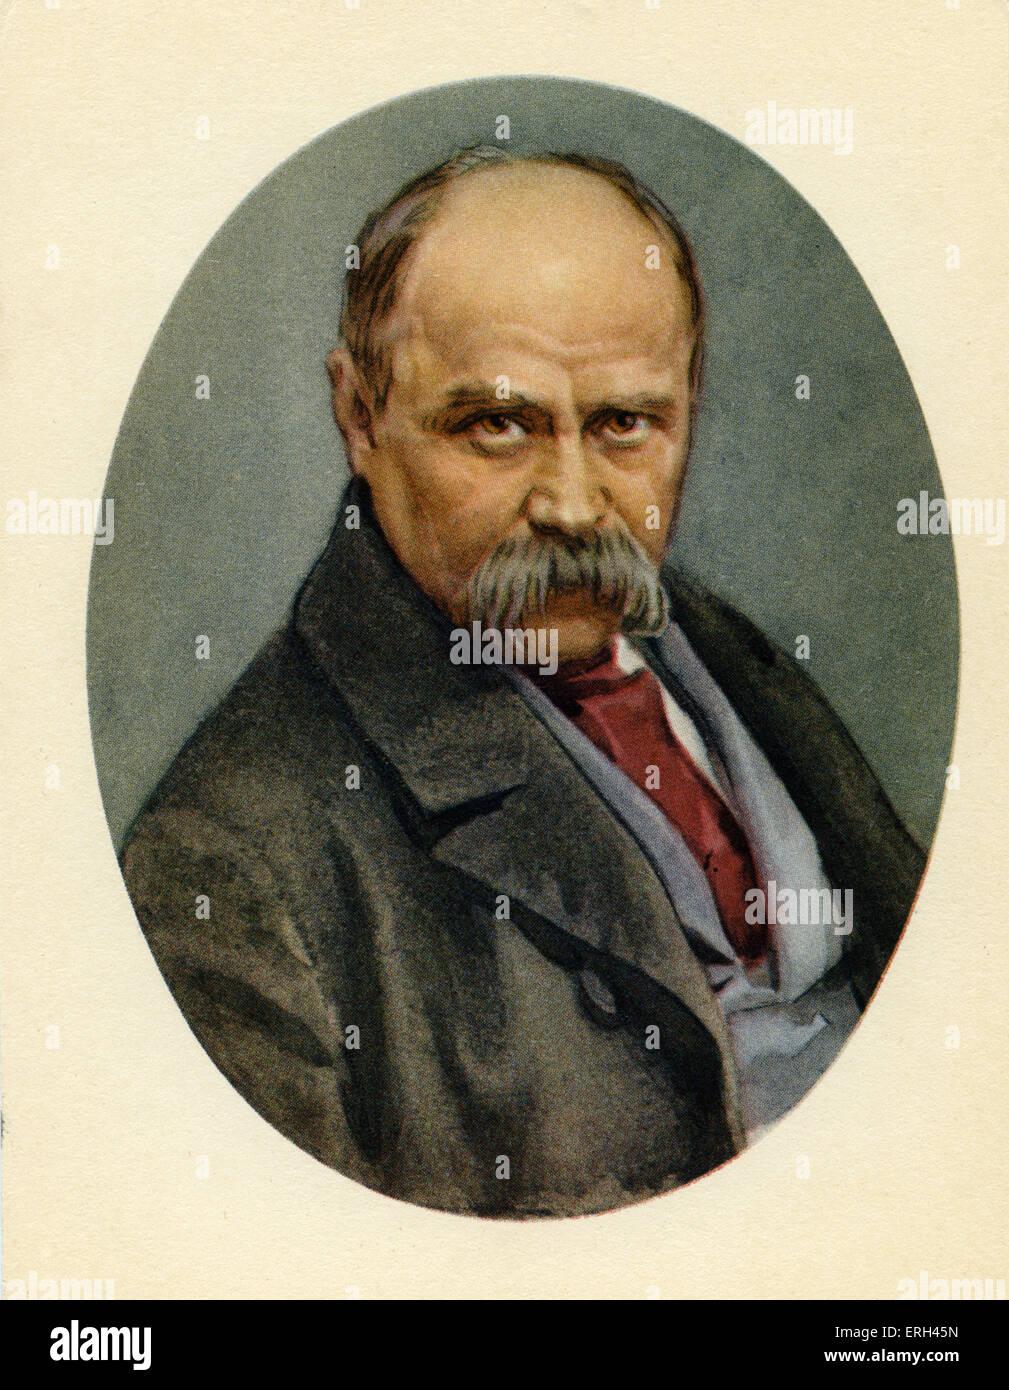 Taras Shevchenko, Ukrainian poet and artist, 9 March 1814 - 10 March 1861. - Stock Image